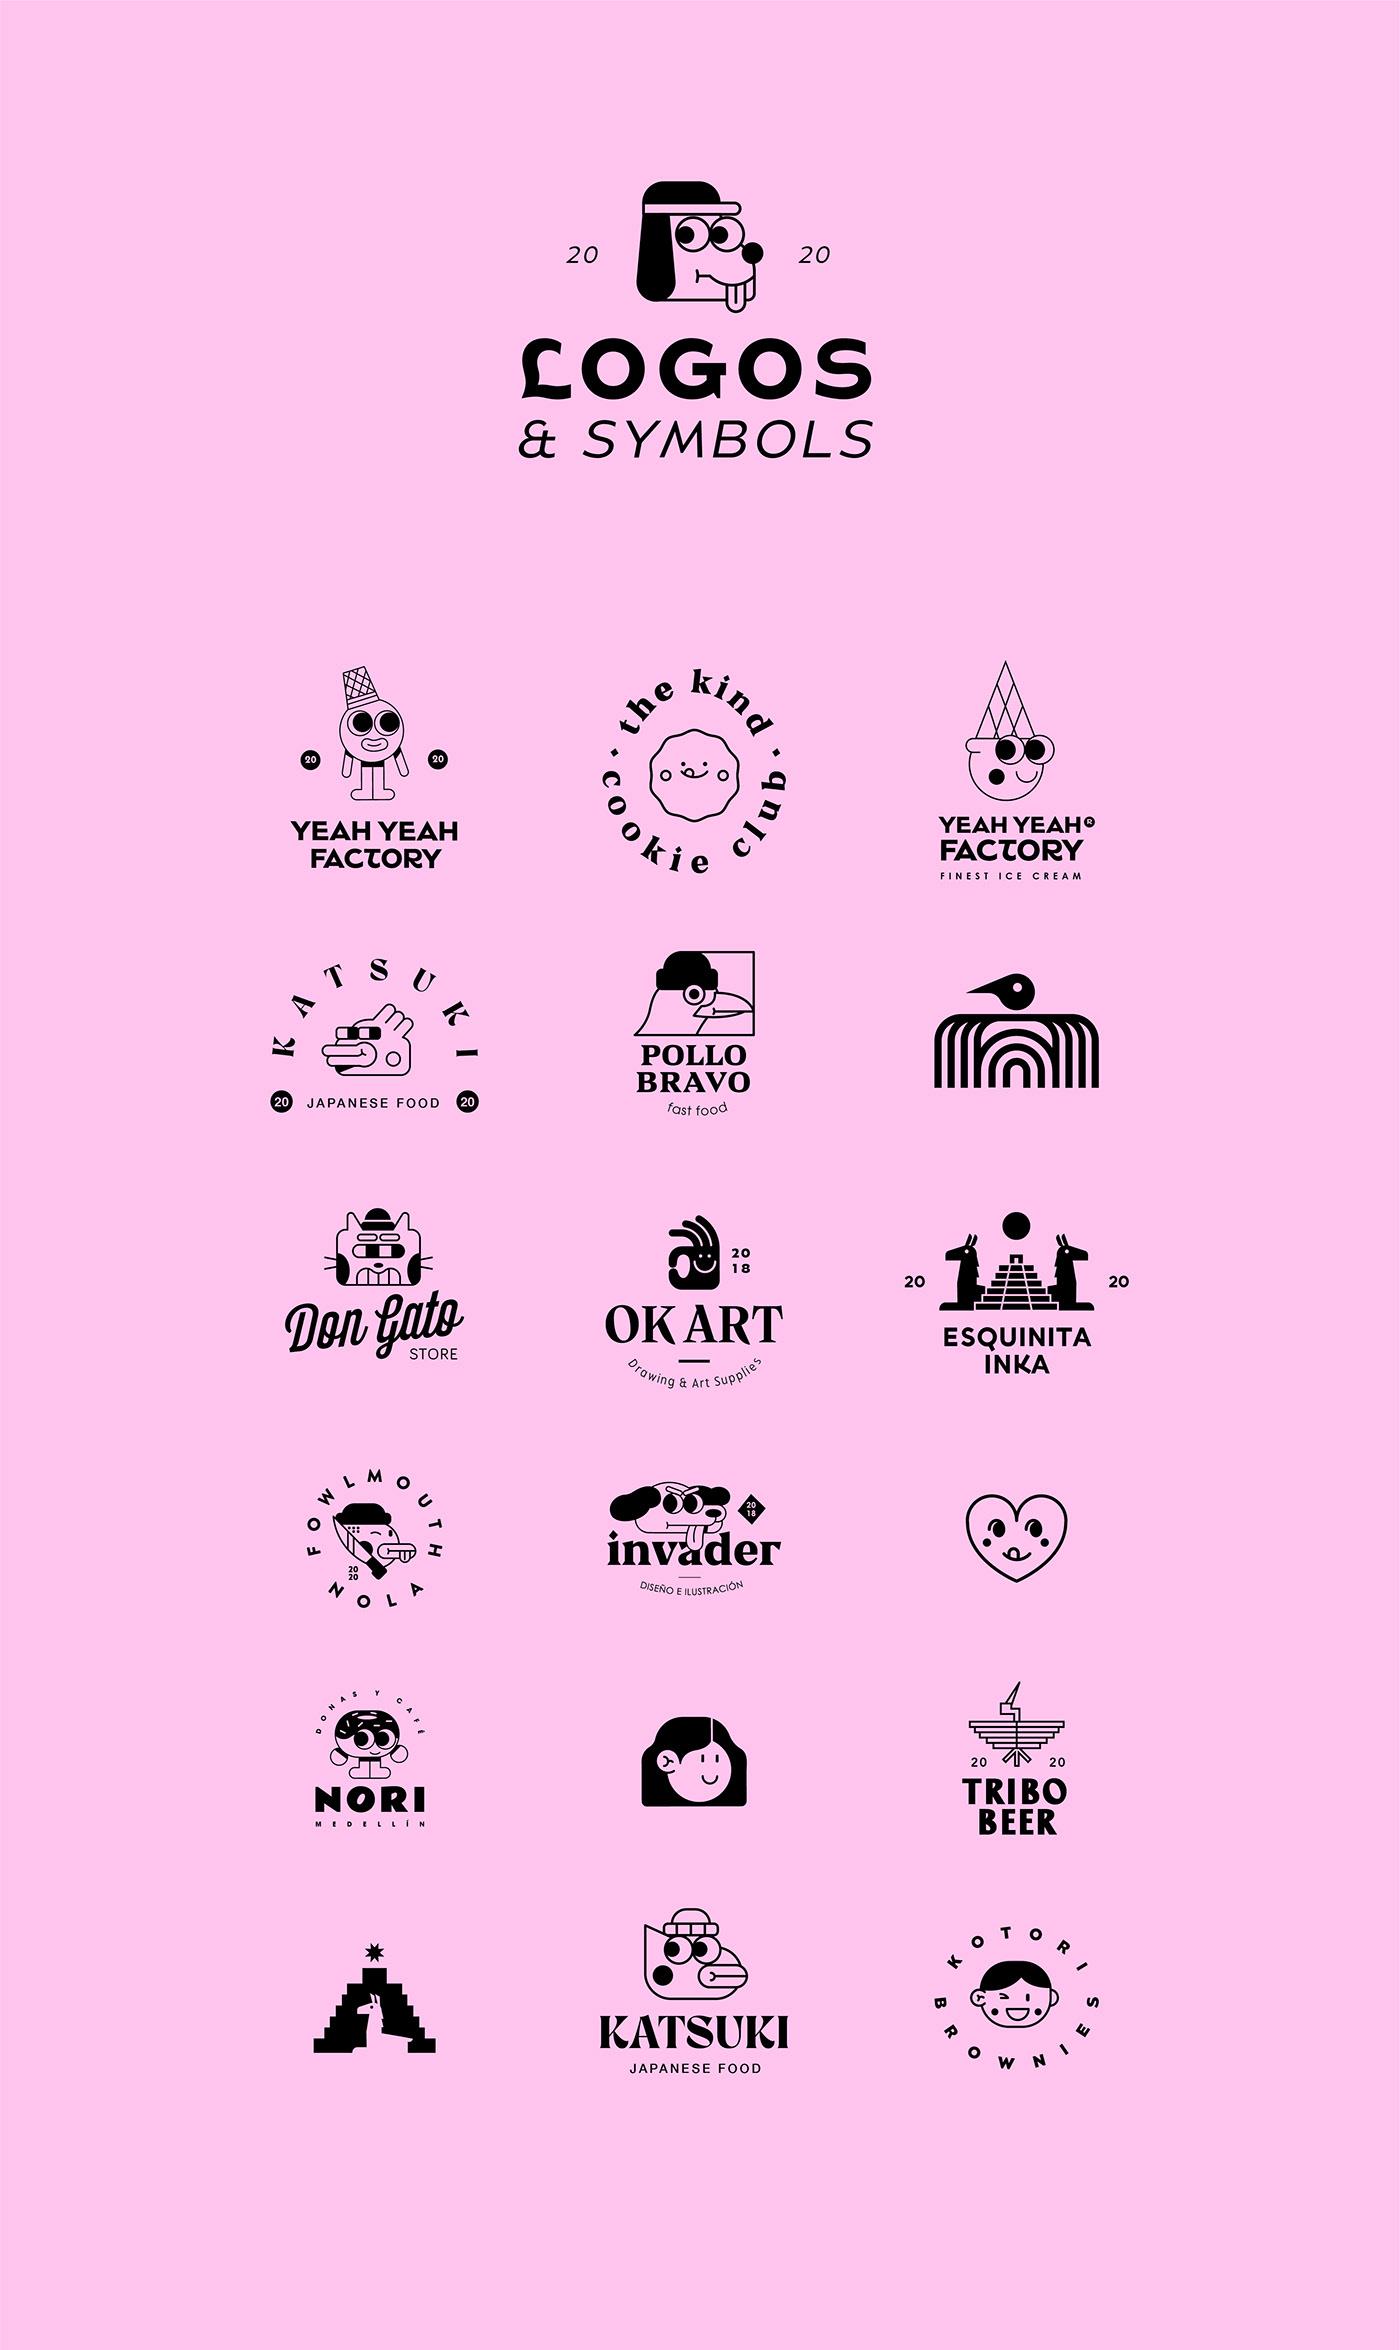 branding  design diseño diseñografico graphicdesign Icon identity logo Logotipo symbols